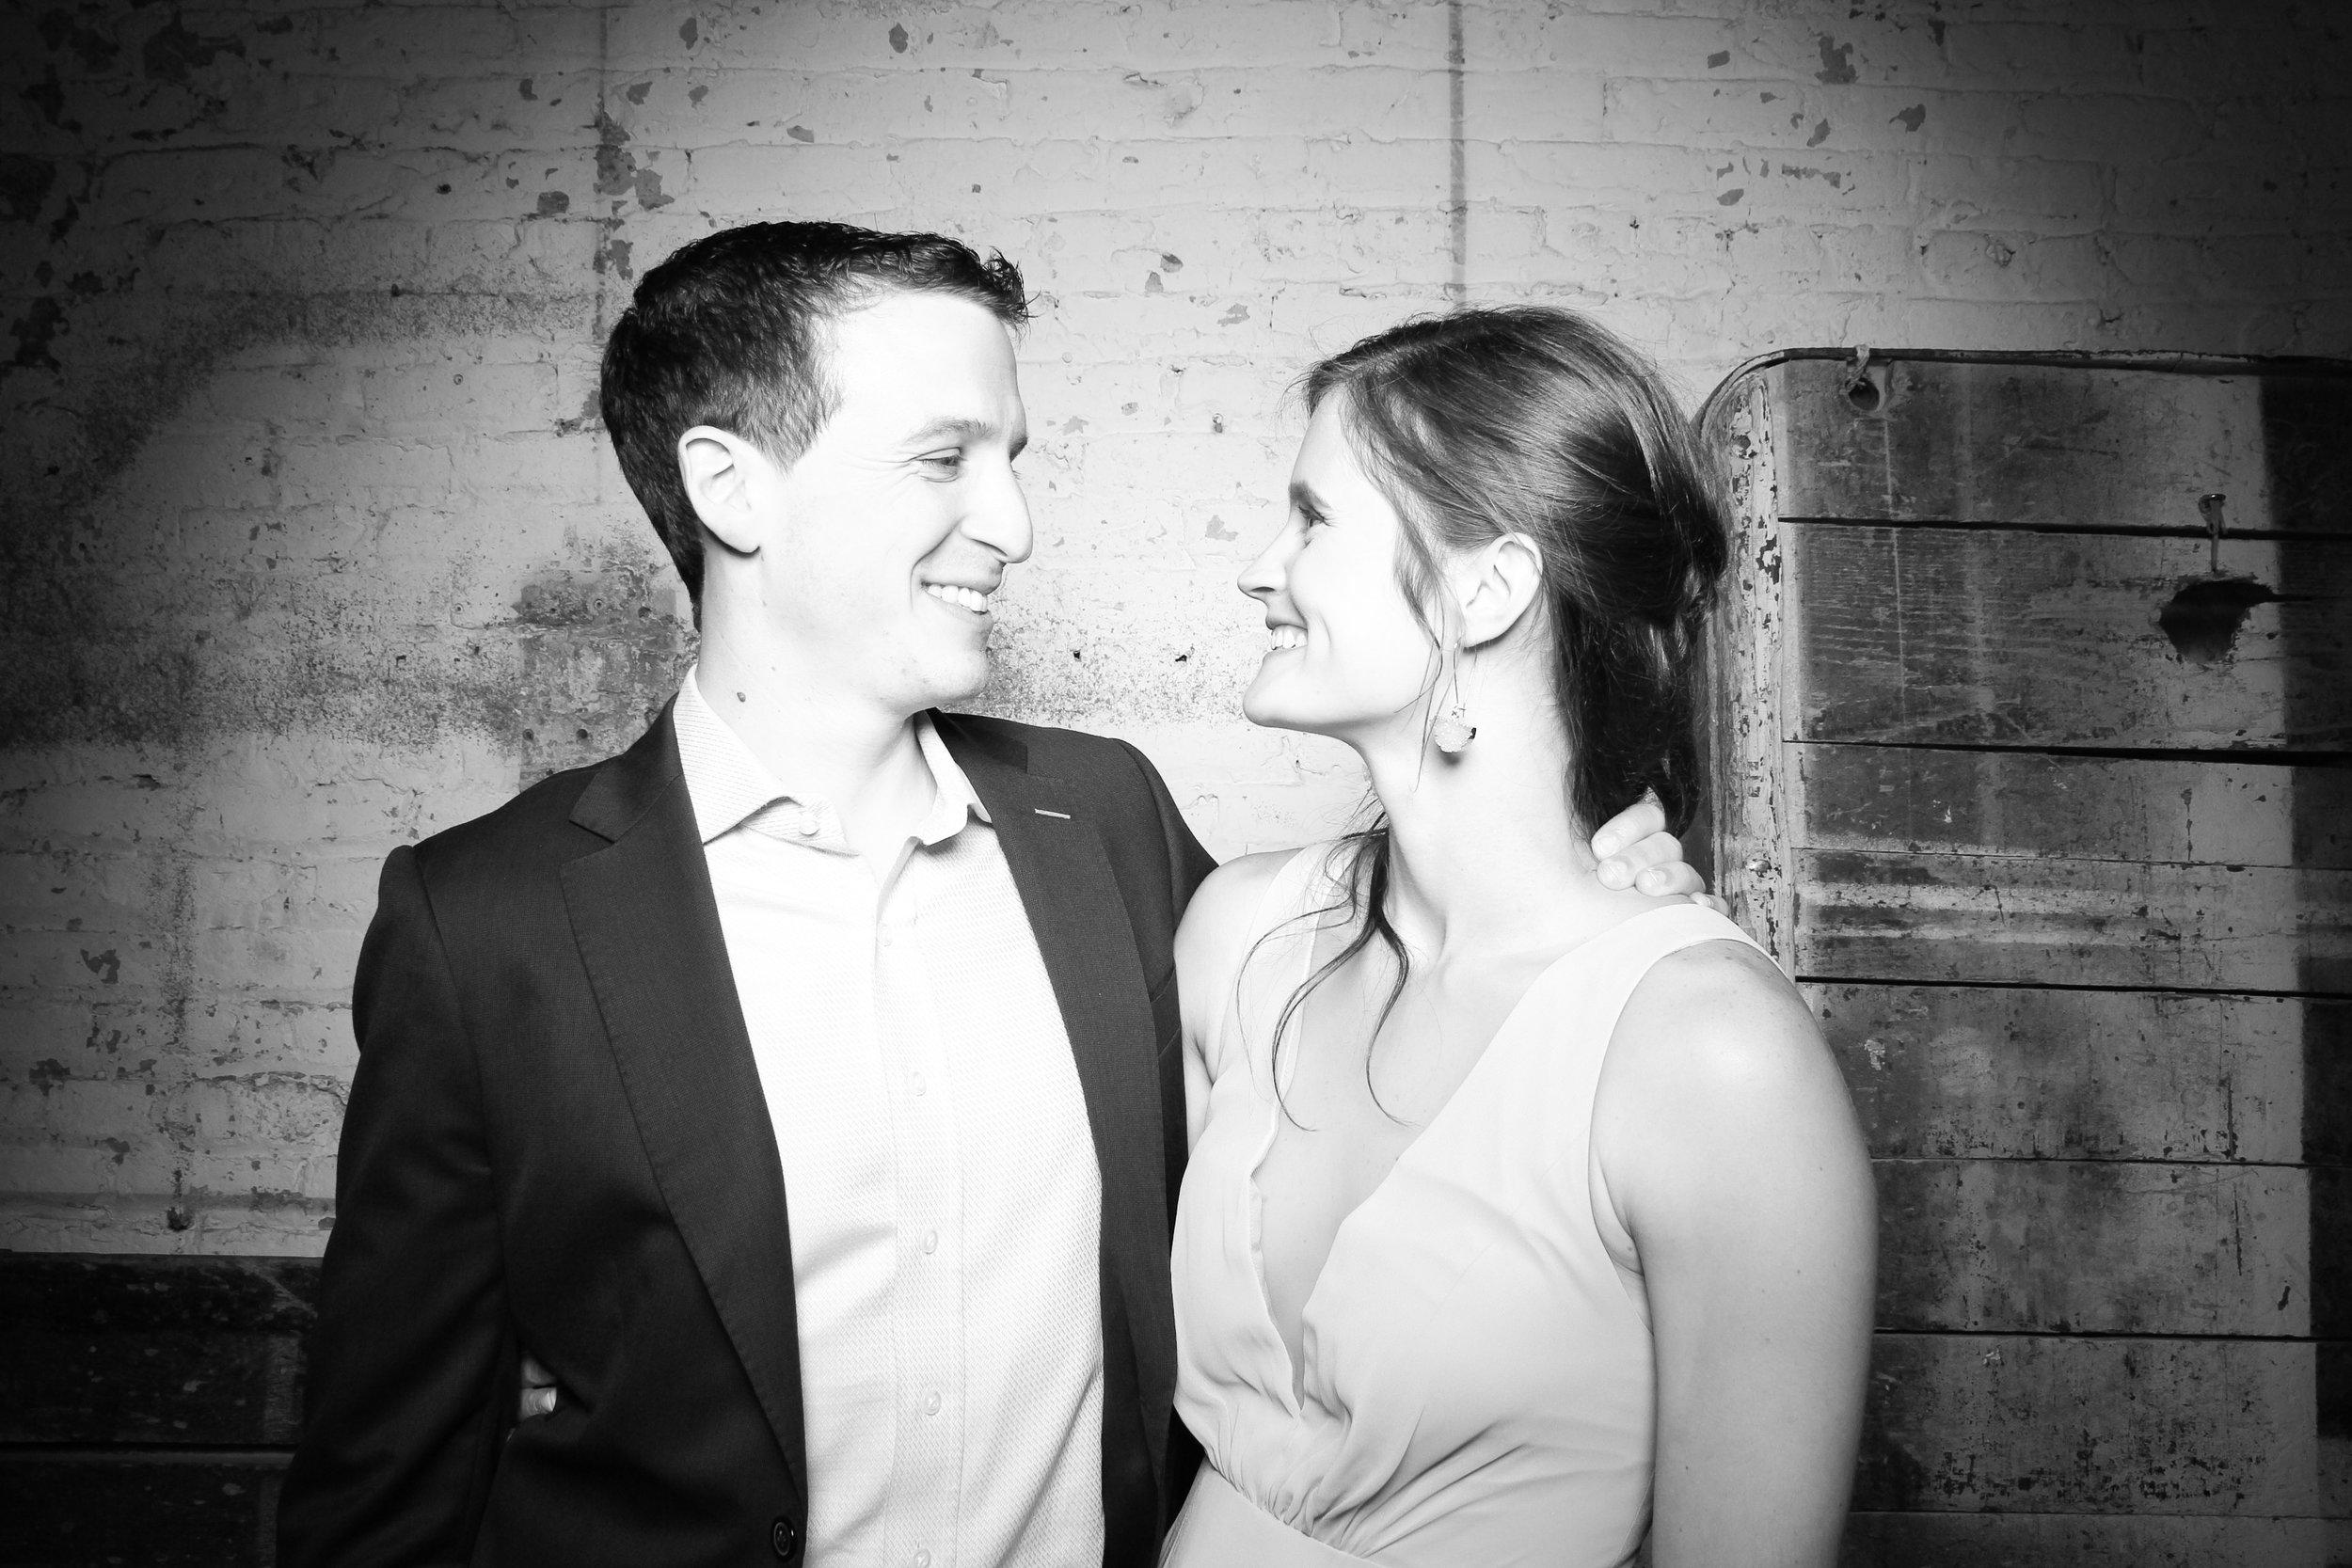 The_Joinery_Wedding_Venue_Logan_Square_Reception_07.jpg